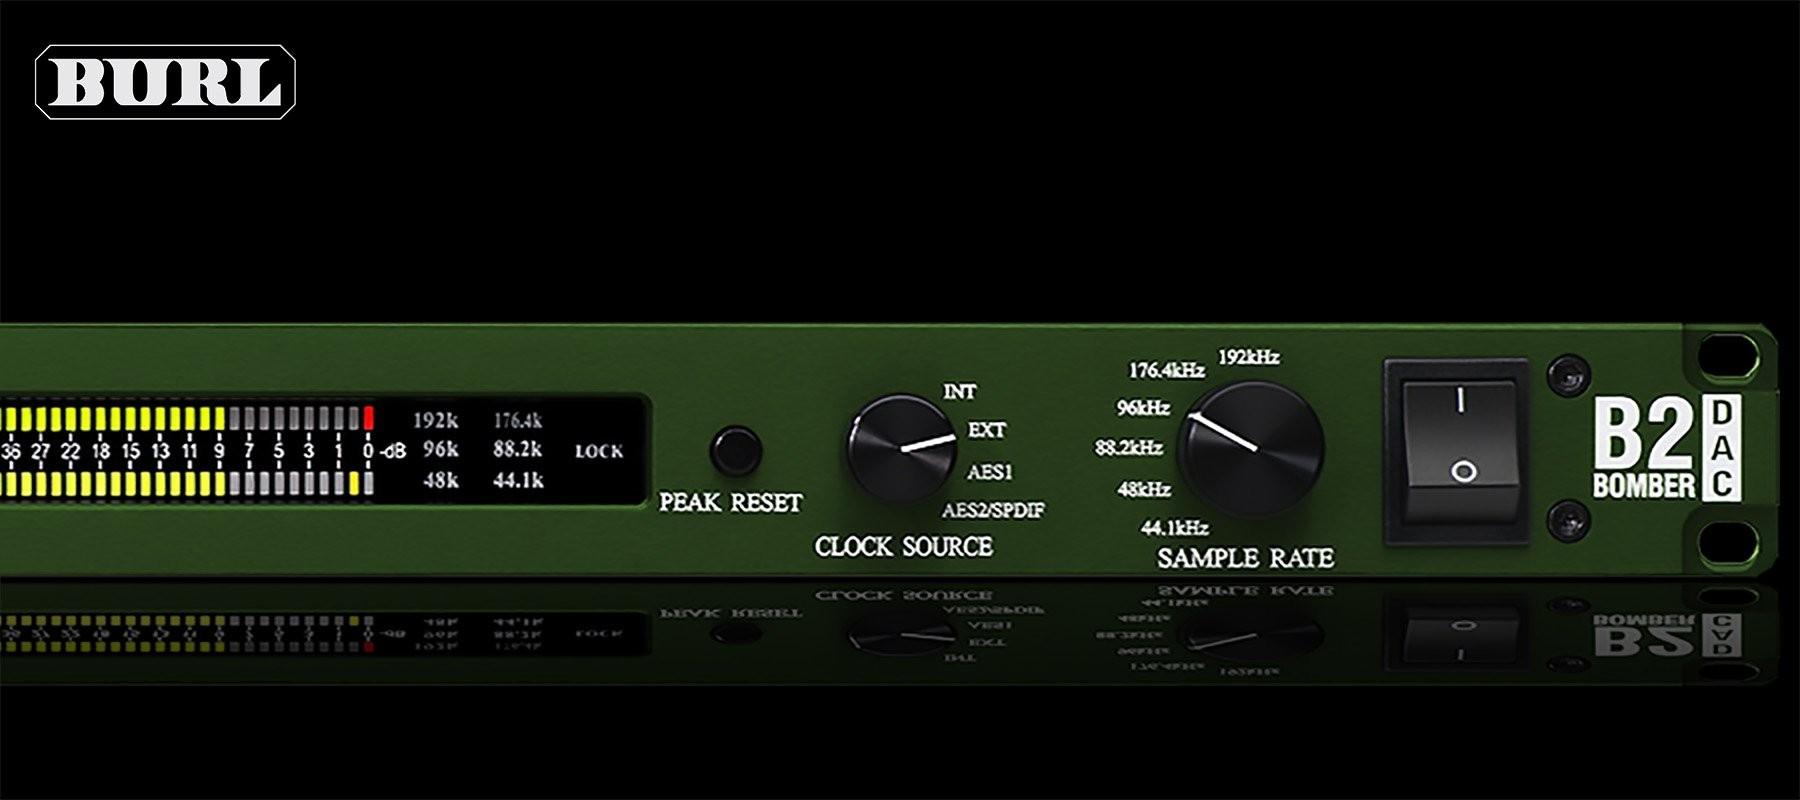 Burl Audio B2 Bomber DAC Droite